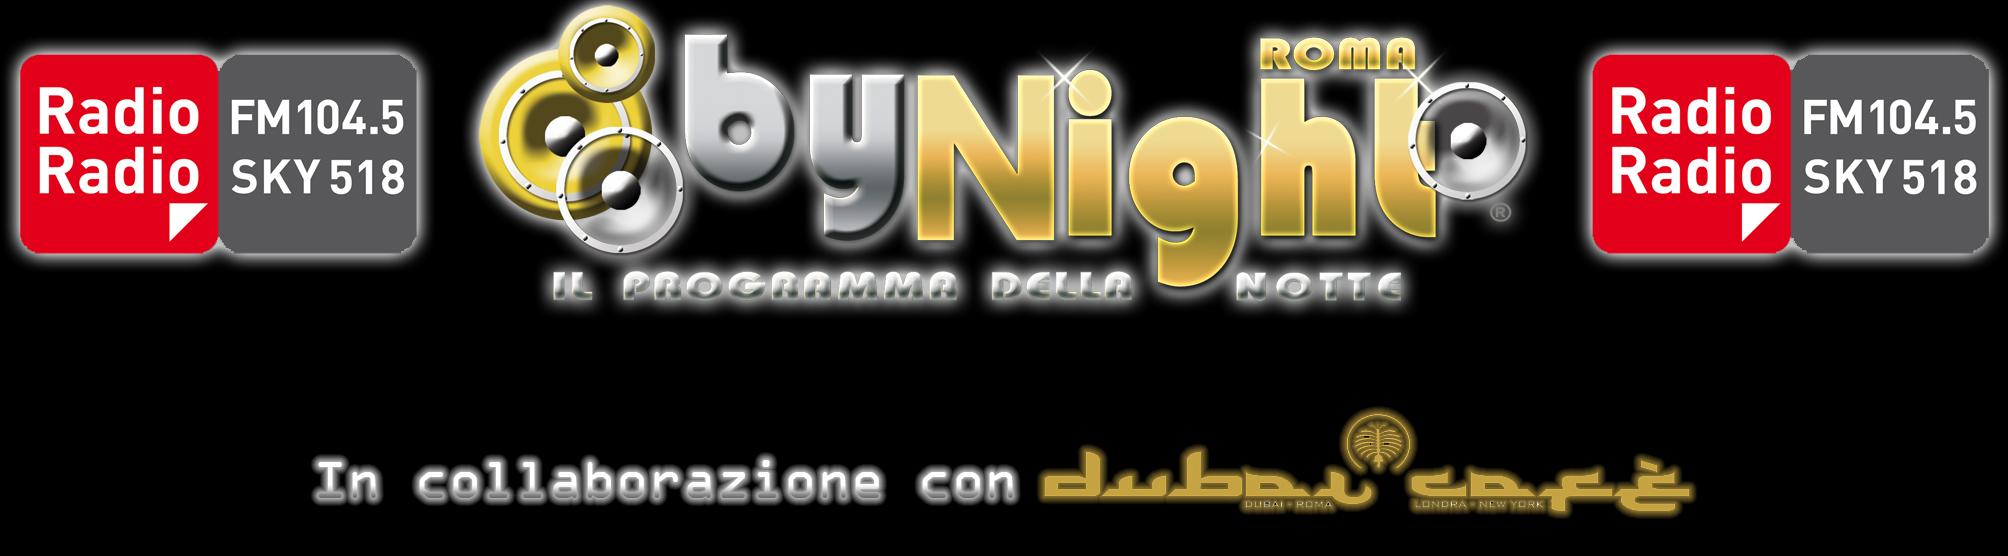 intervista a radio radio by night